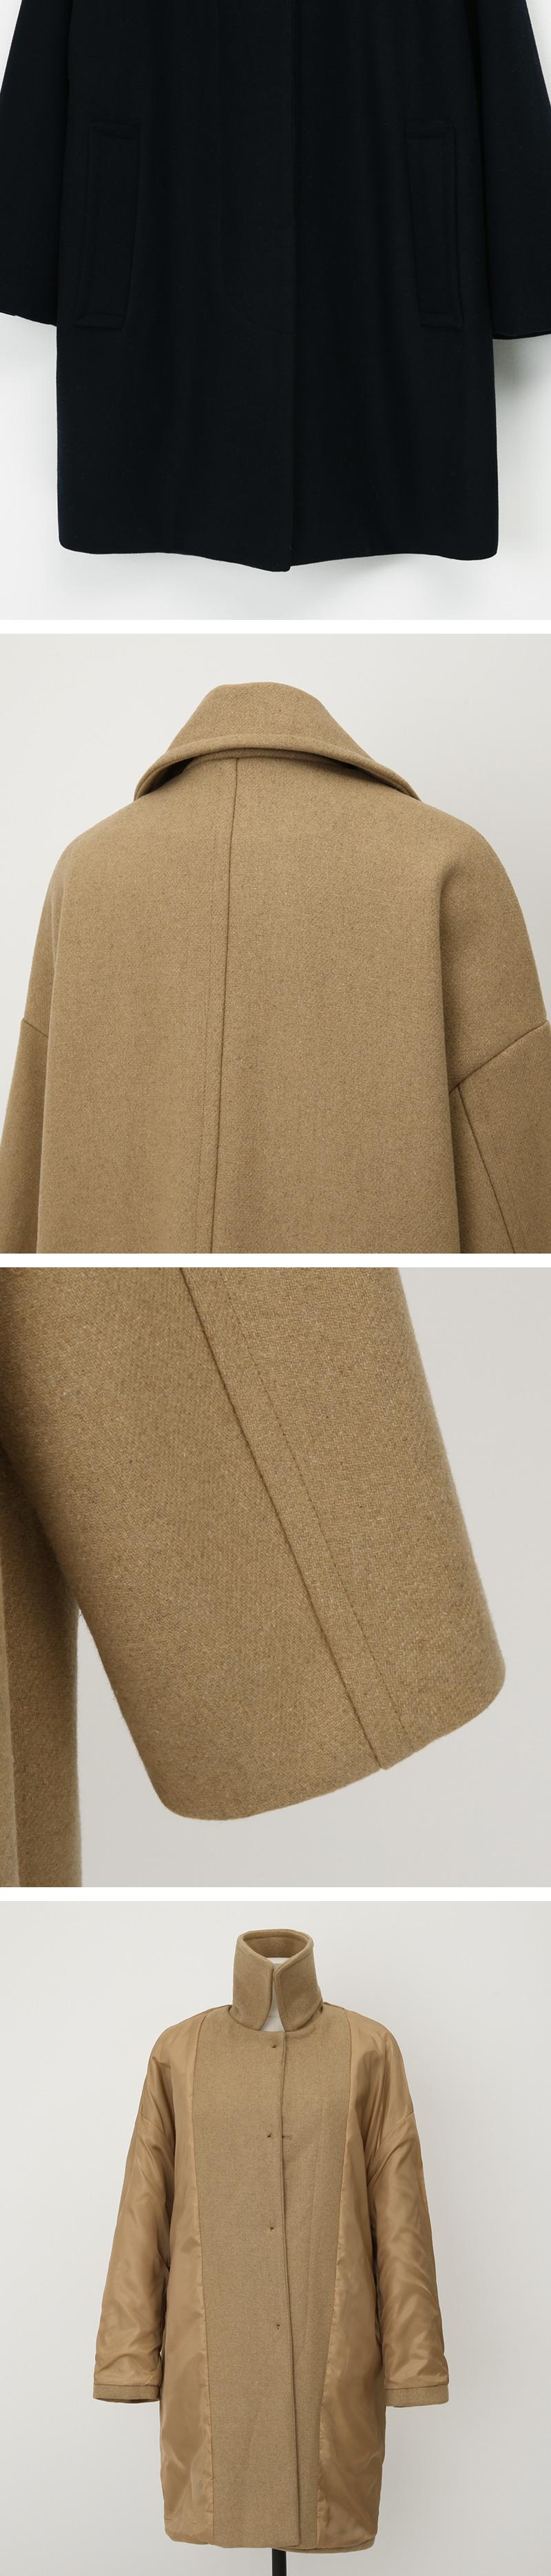 Merd collar wool coat_A (size : free)